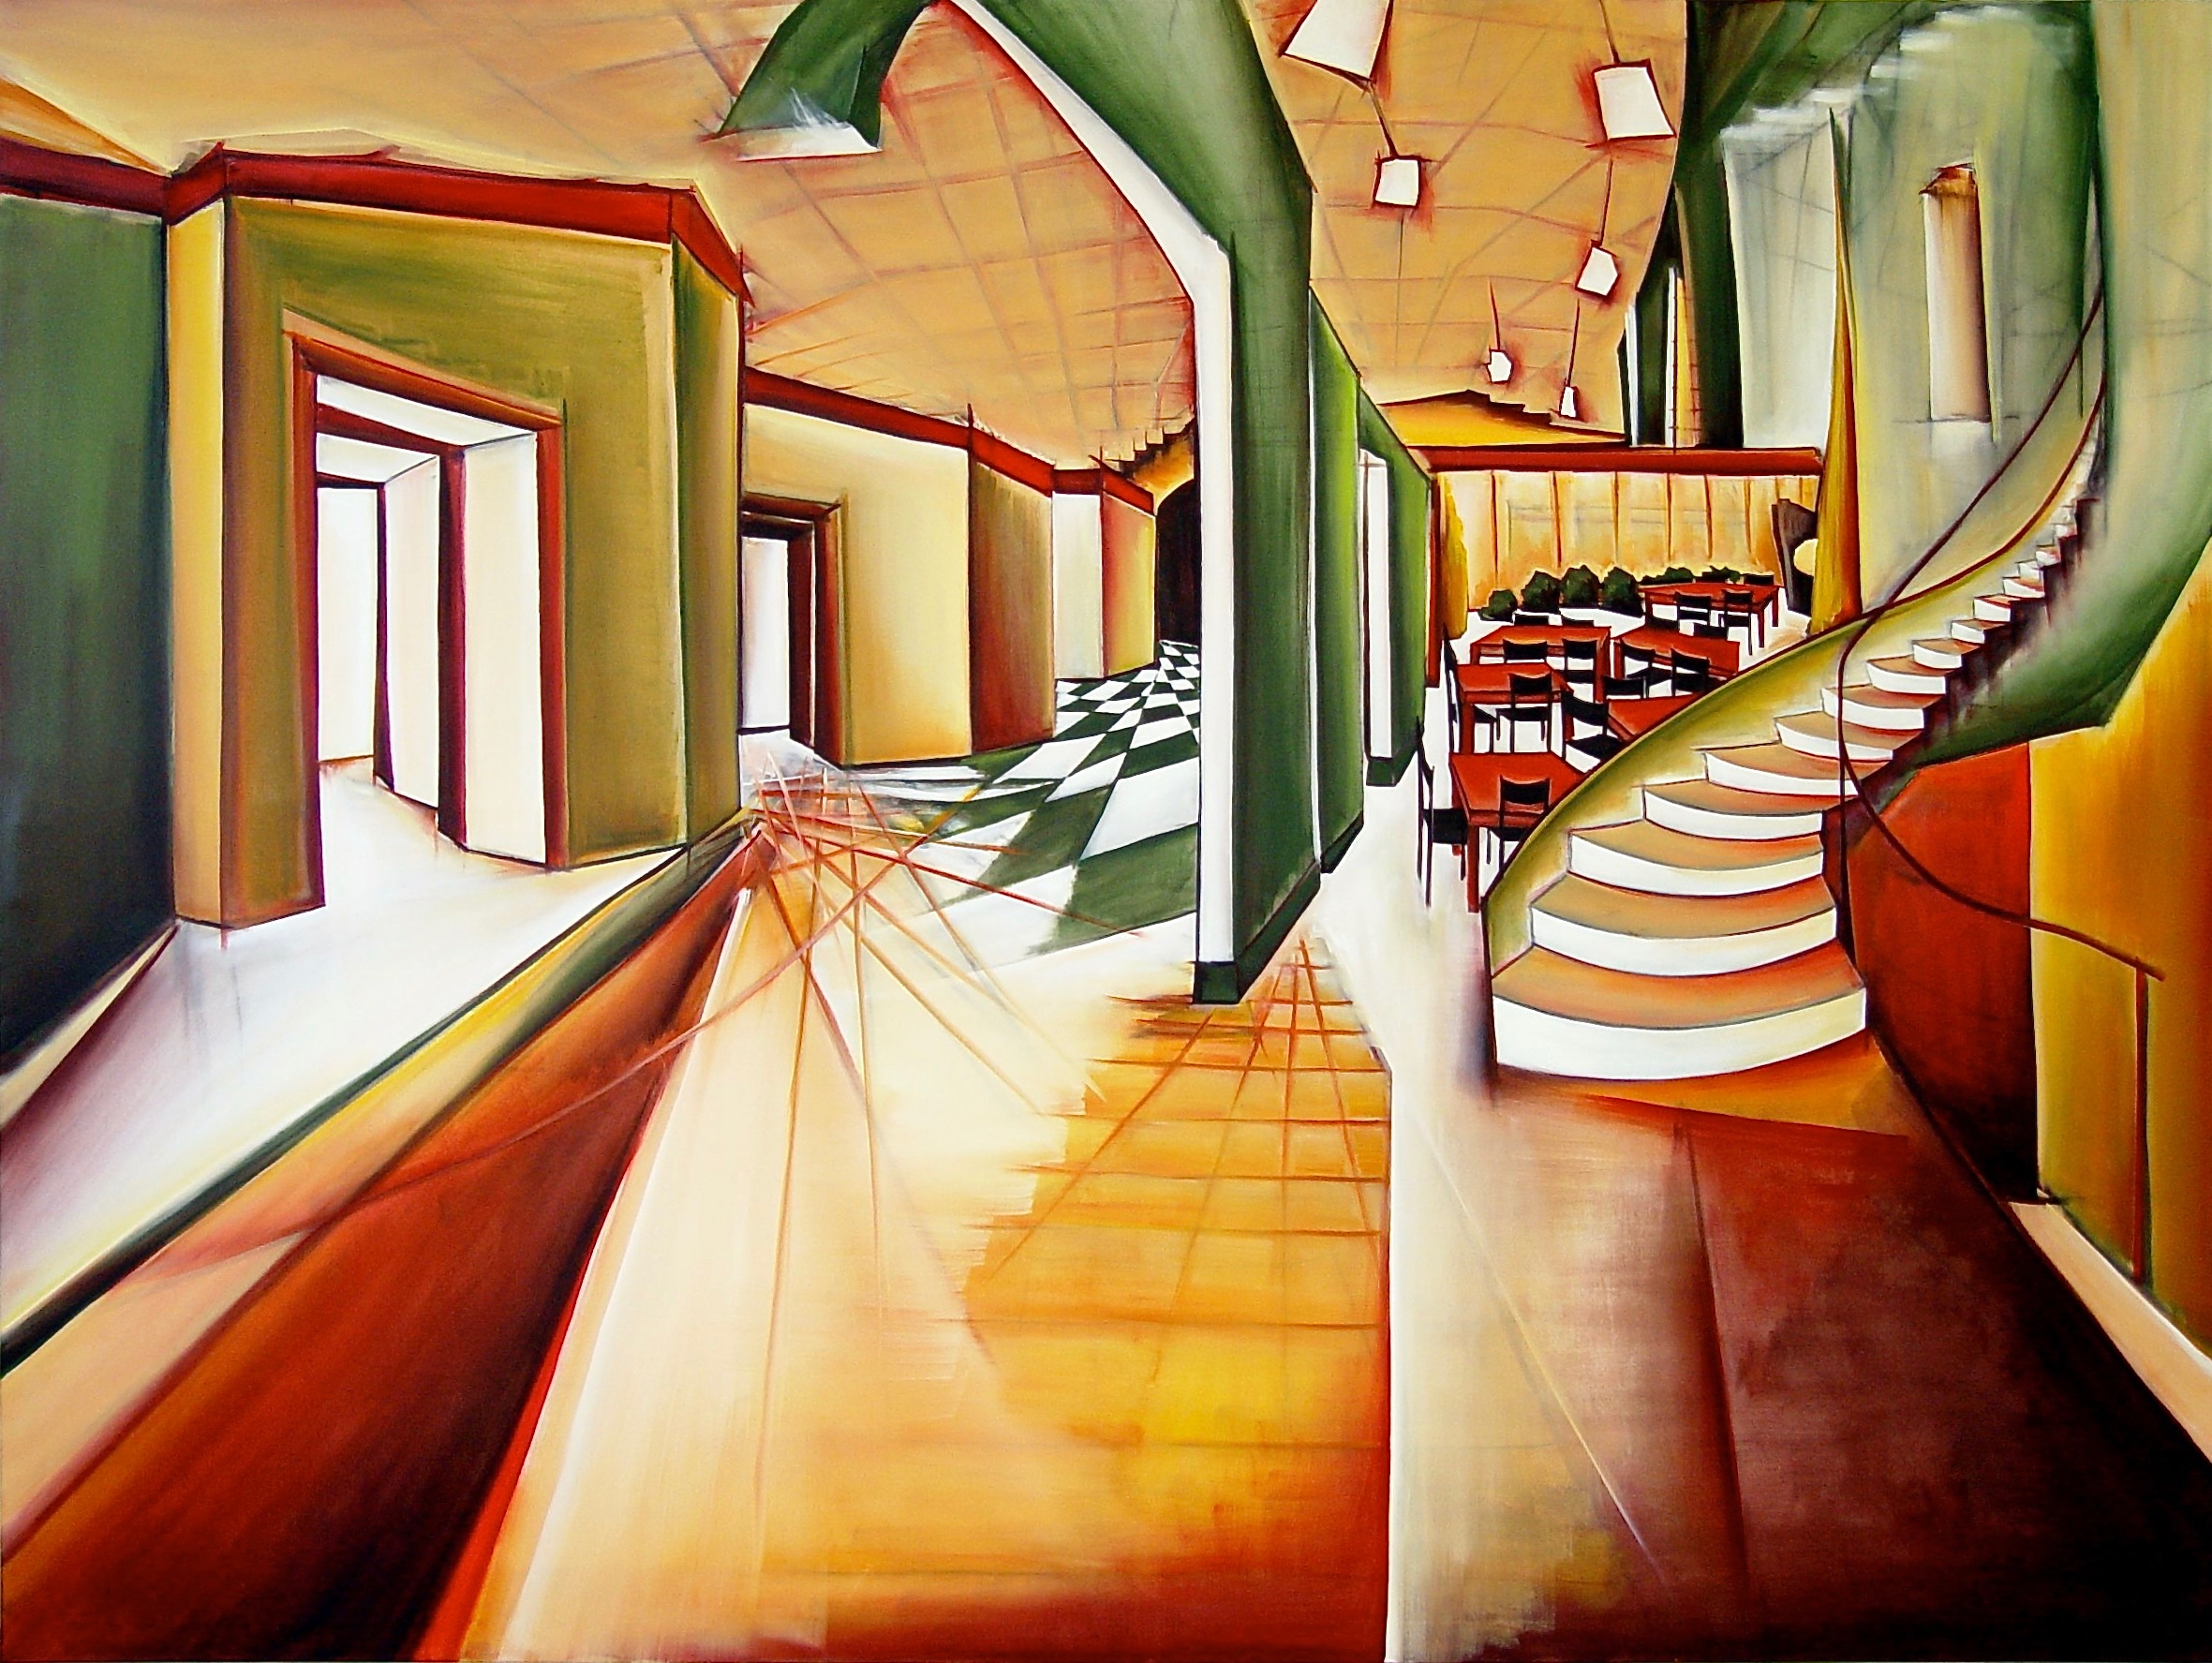 2. Theater room, Oil on canvas, 150 x 200 cm.jpg